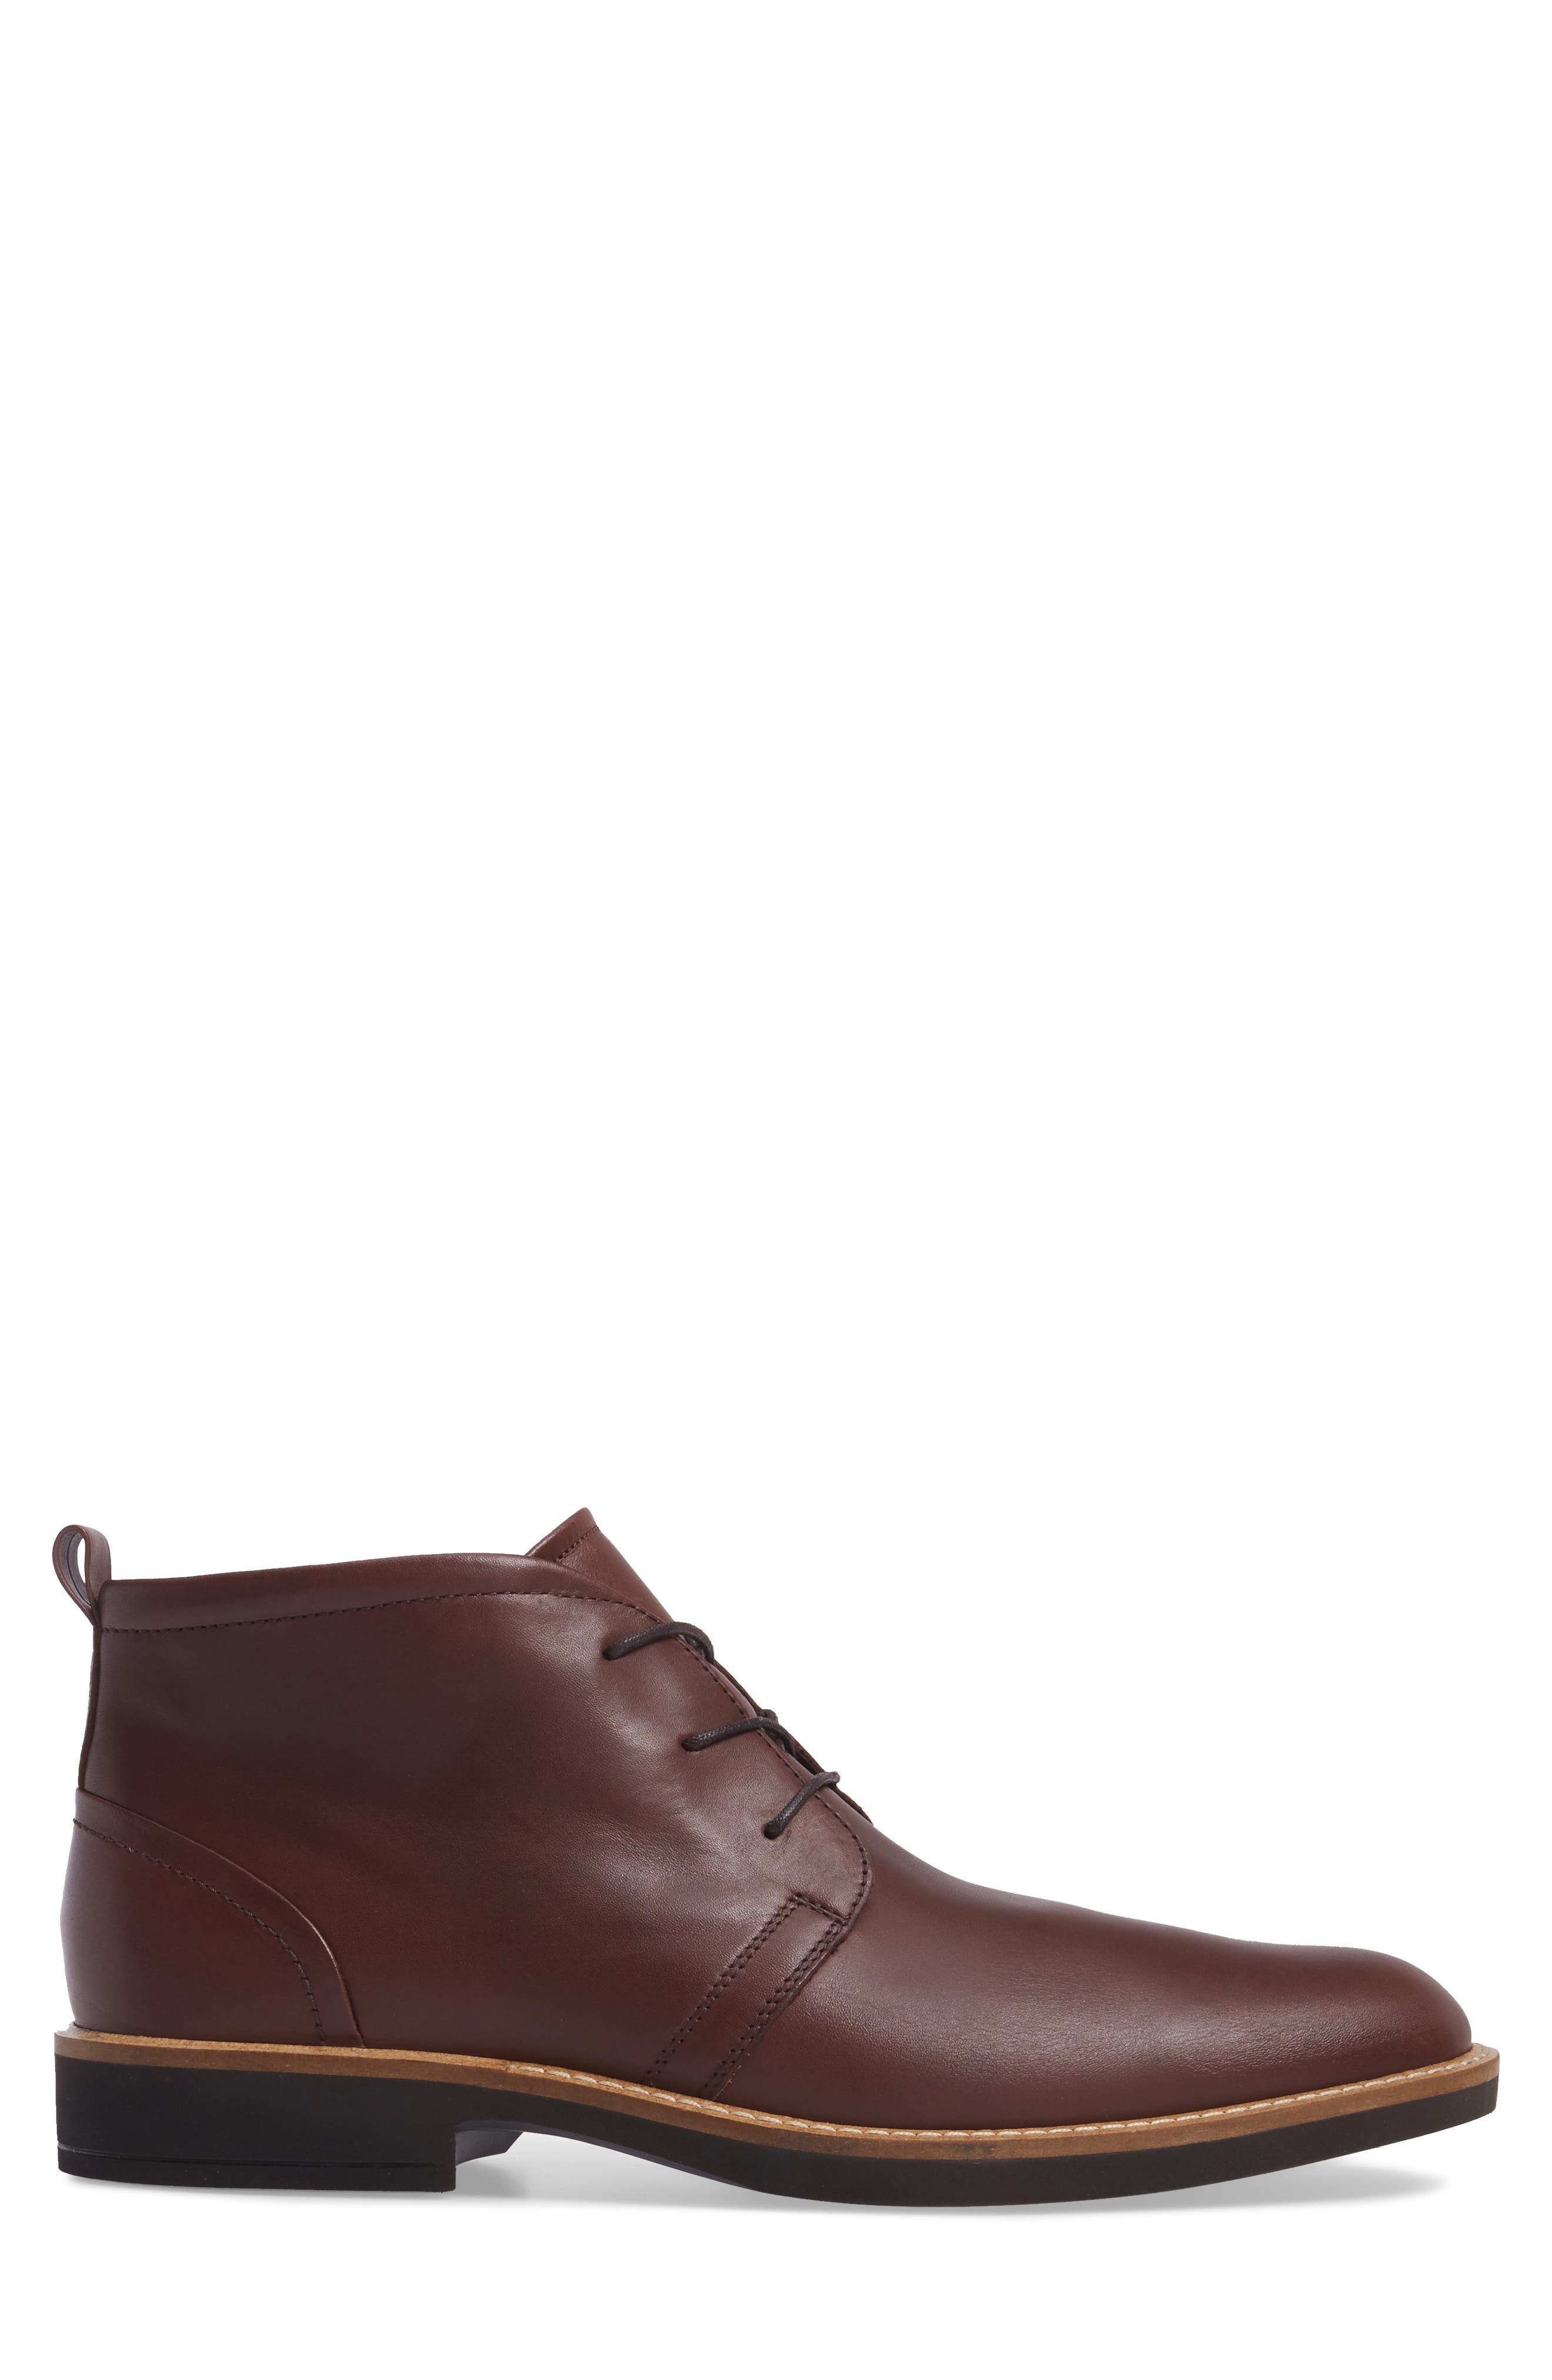 Biarritz Chukka Boot,                             Alternate thumbnail 3, color,                             Rust Leather